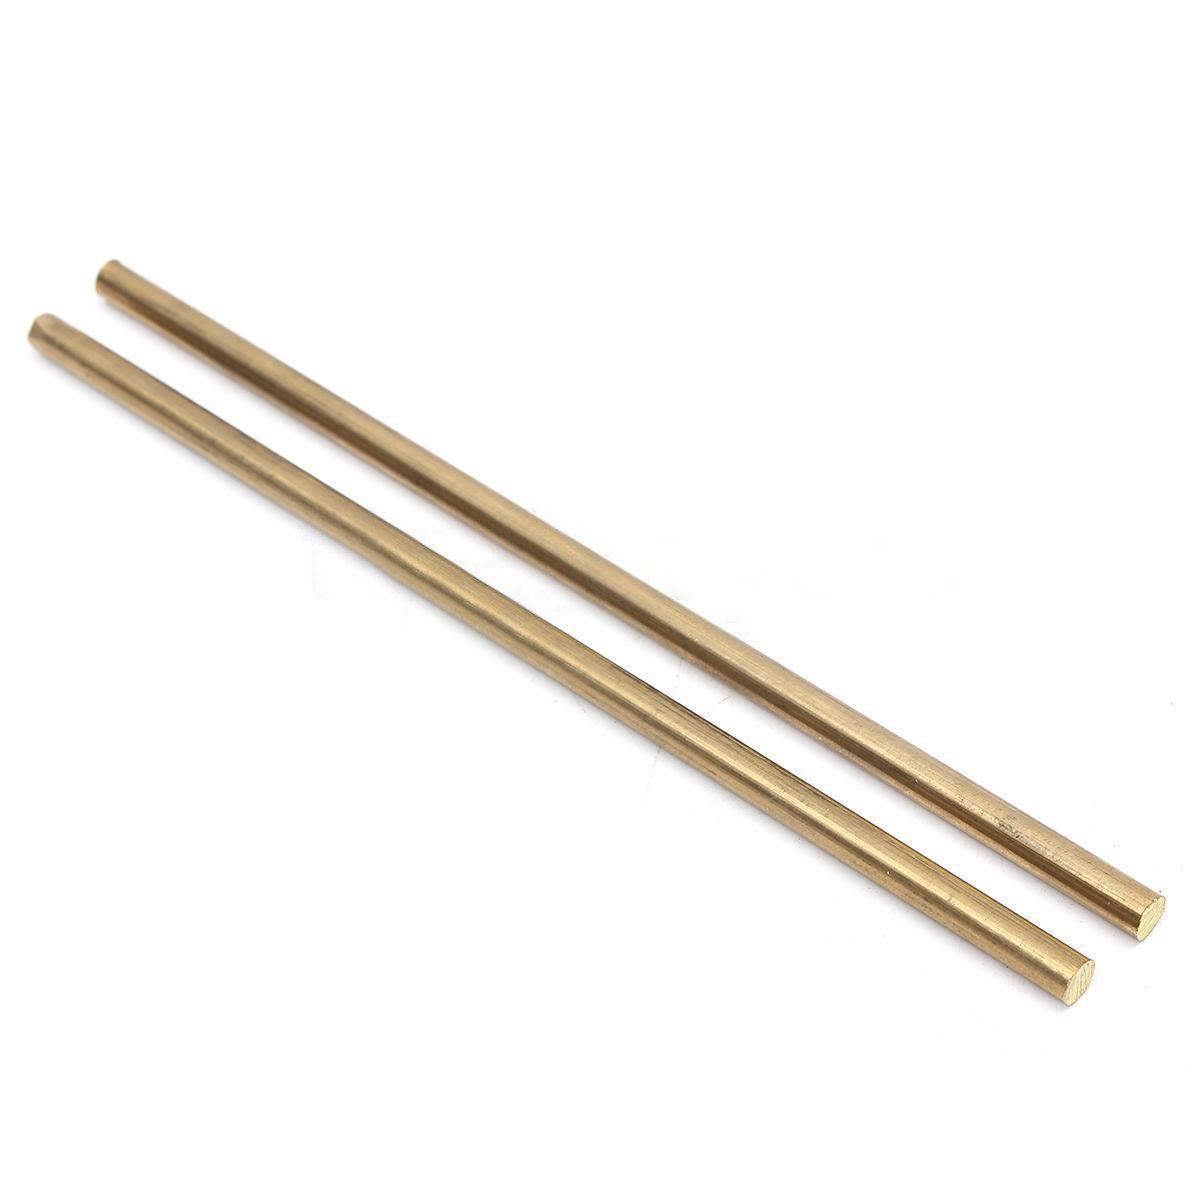 2pcs Brass Rods Stab Bar Unpolished Round Rod Hardware 5mm x 150mm 1/4' NaroFace